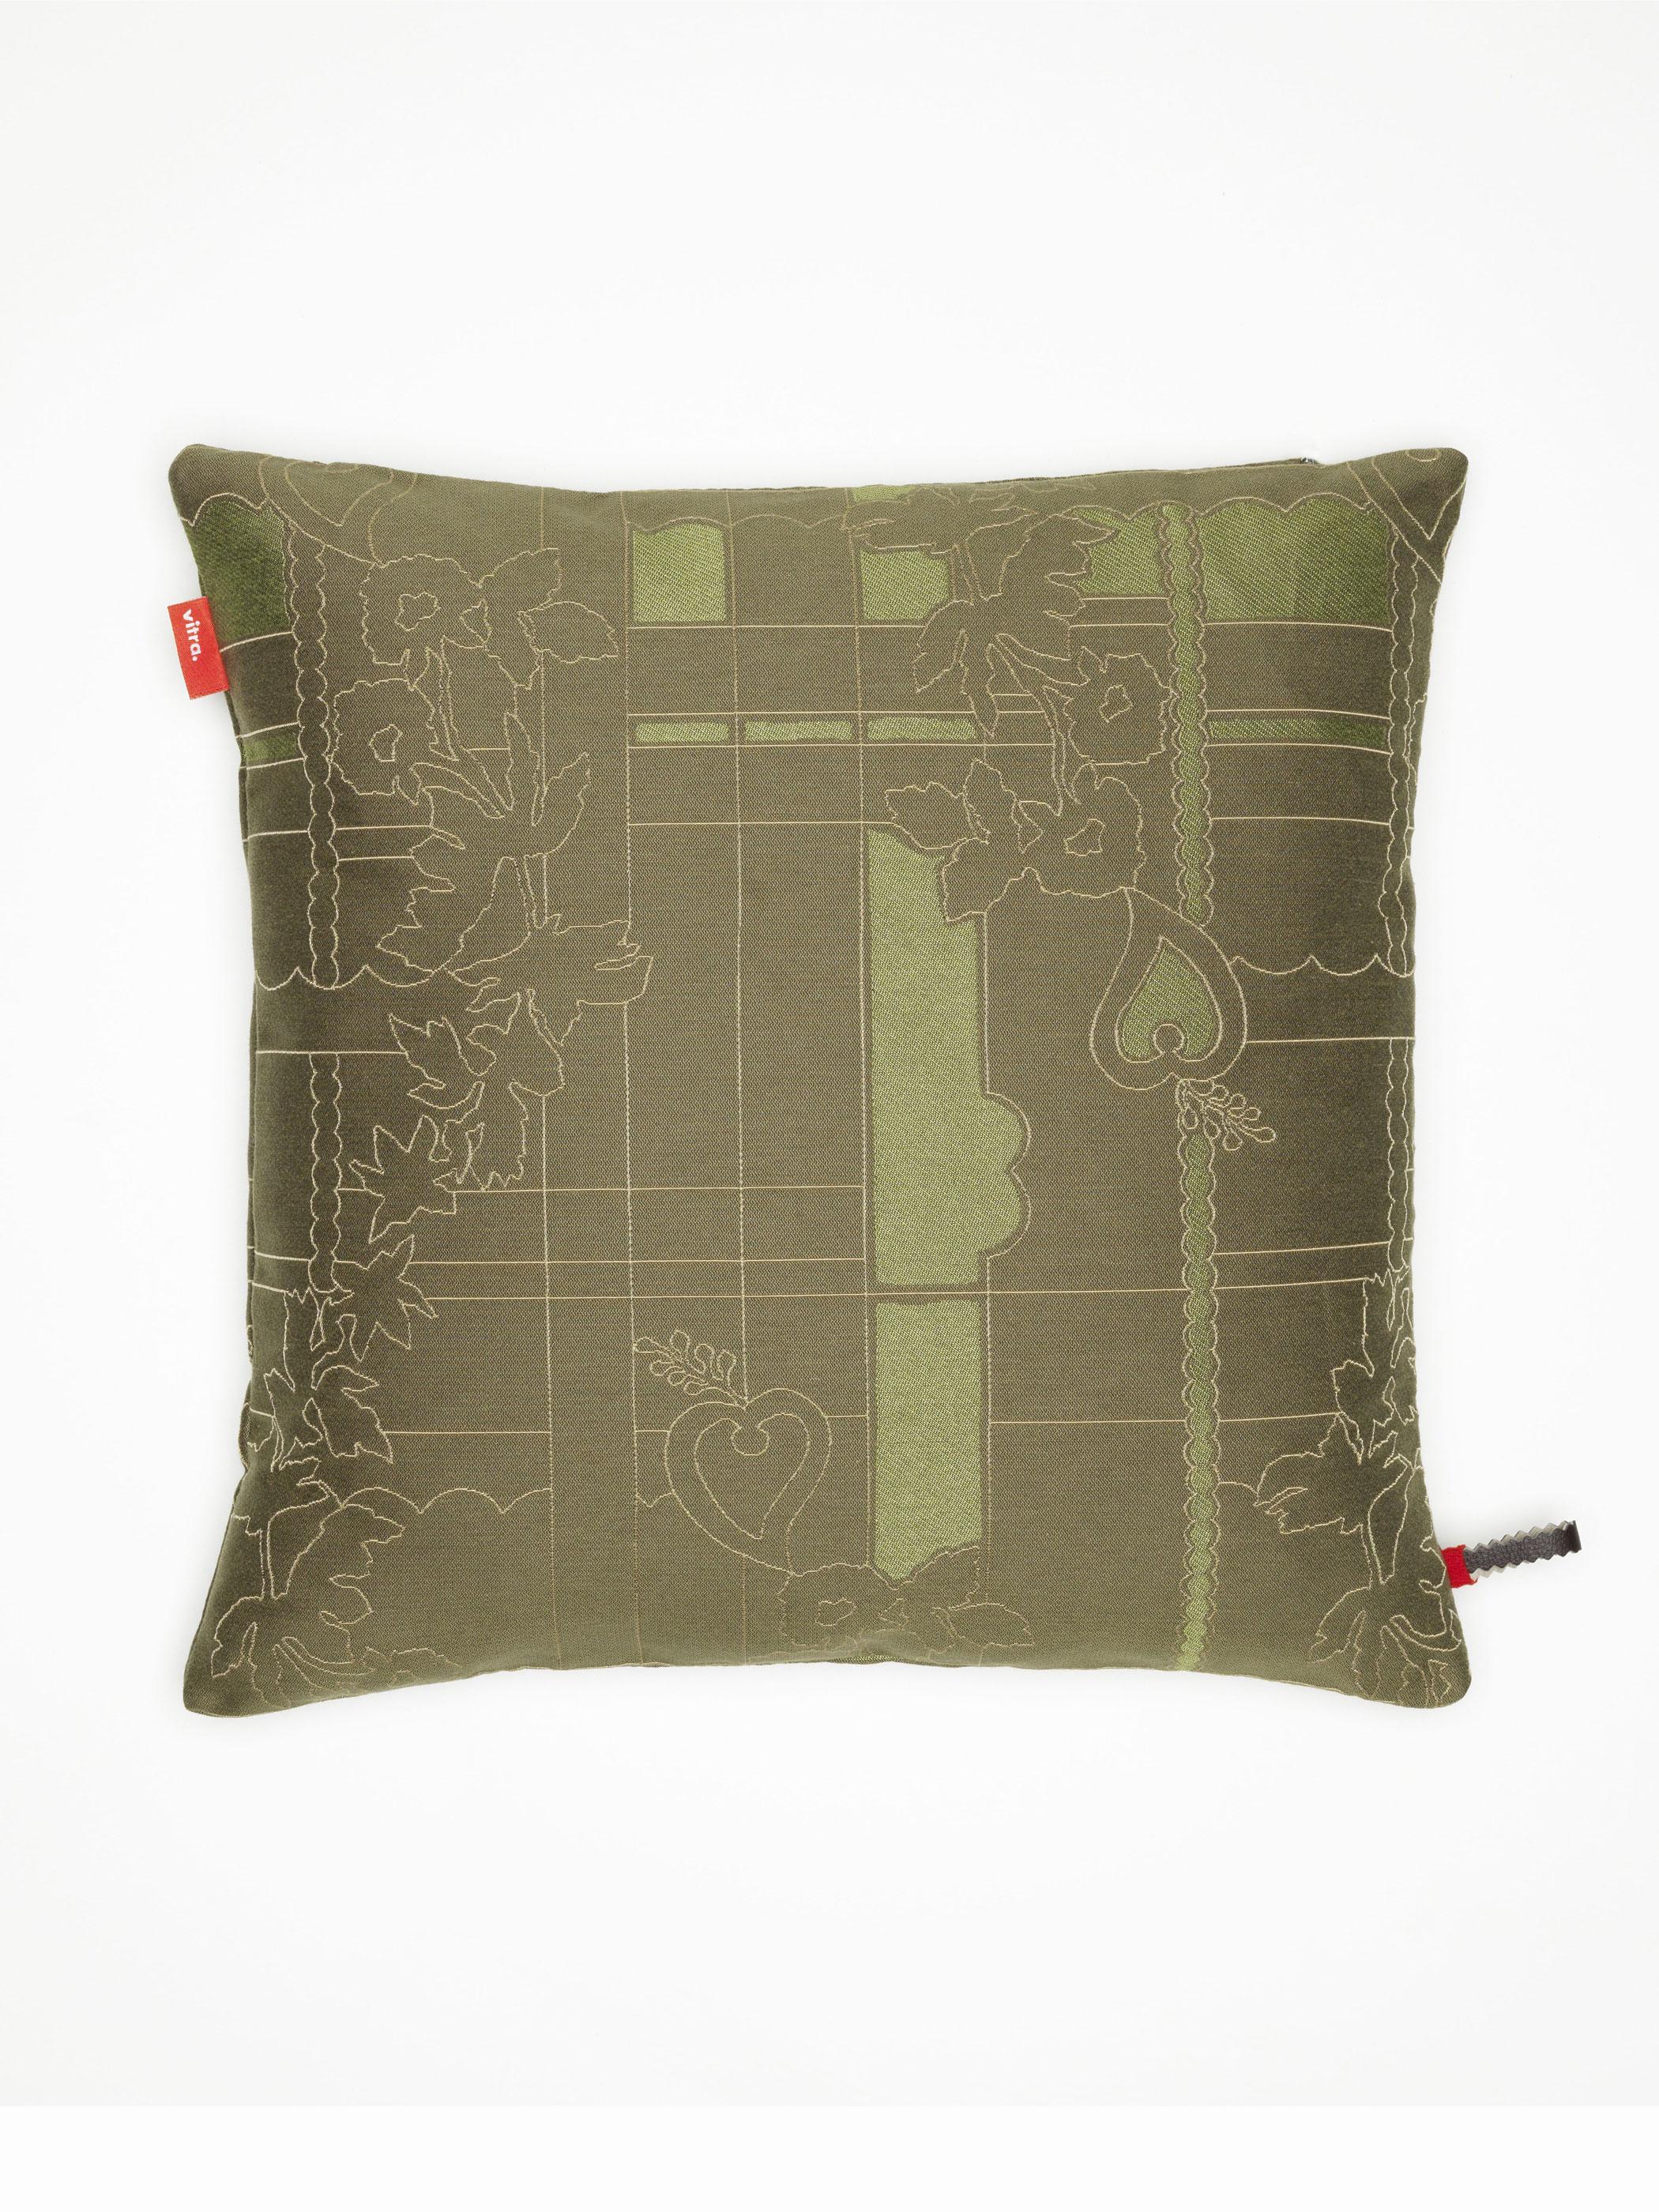 vitra kissen maharam park woven bamboo lichen produktdetails. Black Bedroom Furniture Sets. Home Design Ideas